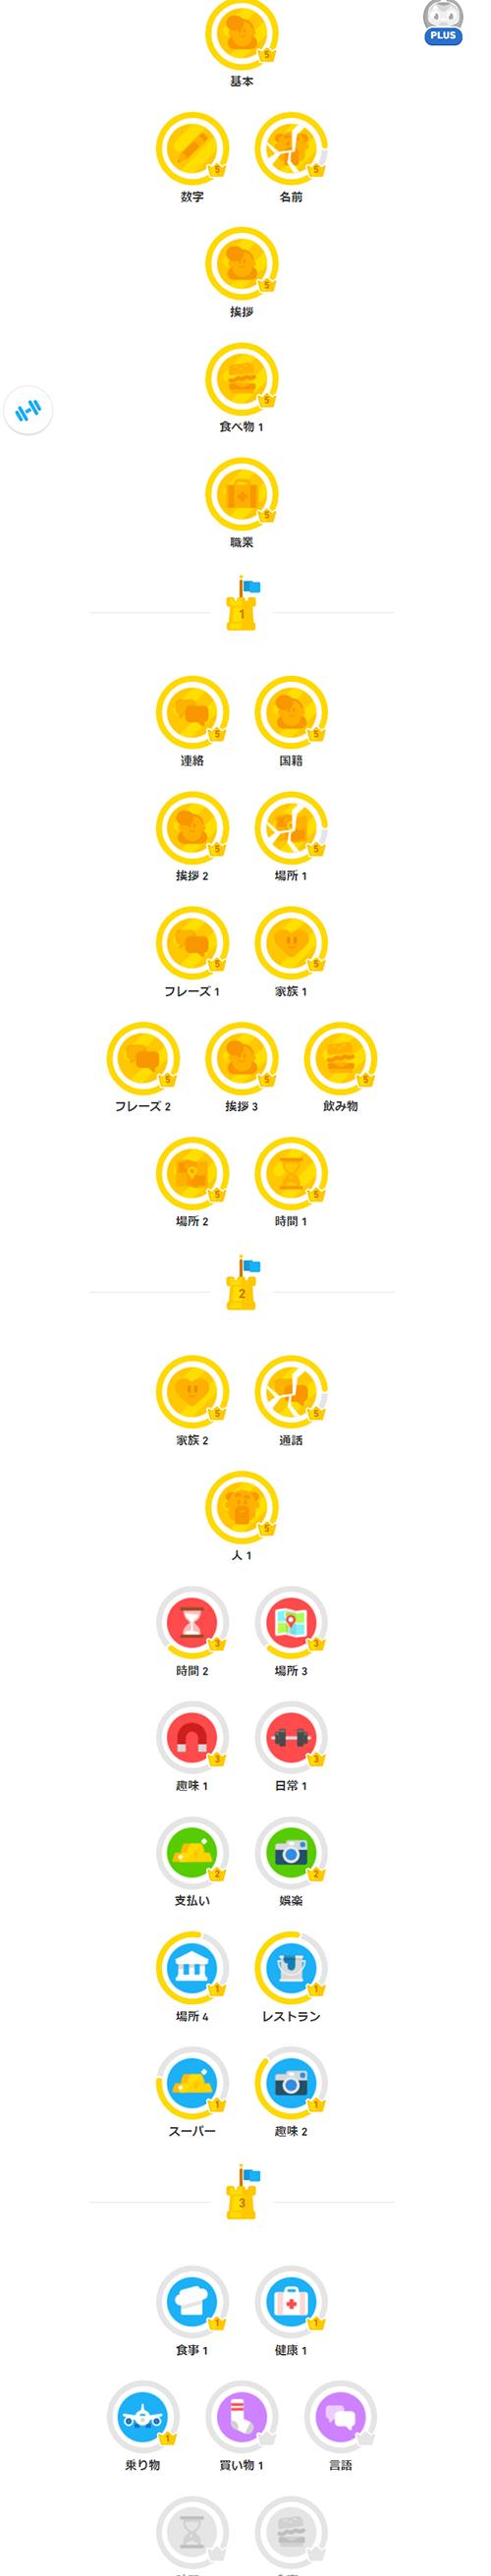 Duolingo進捗